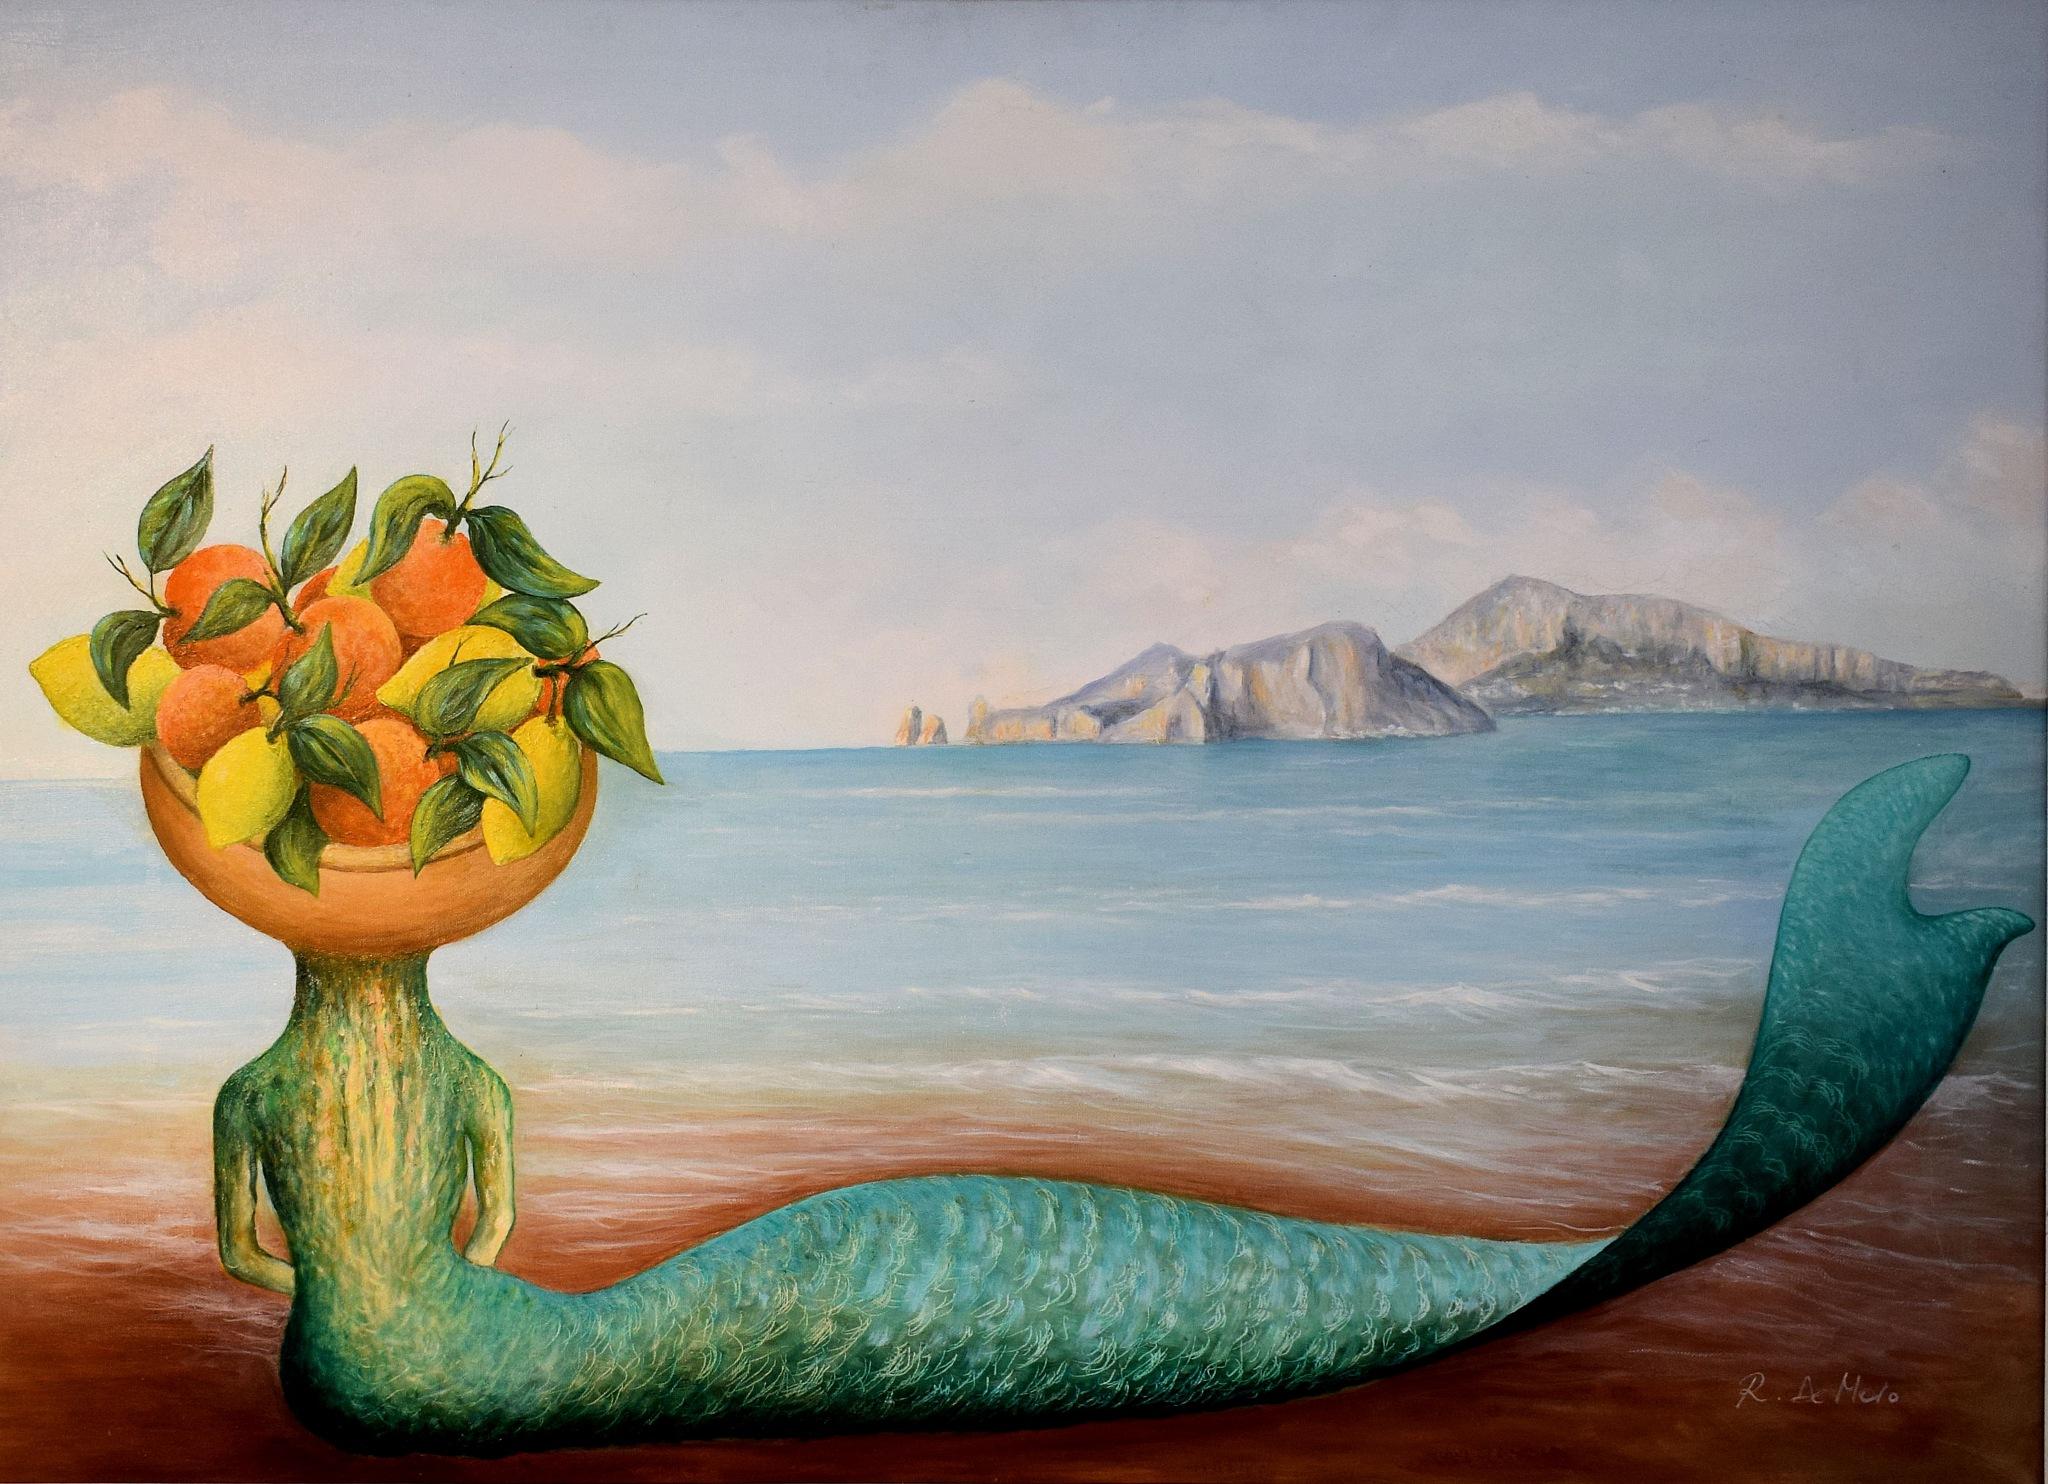 P.A.N. Napoli - Raffaele De Maio - The Mermaid of Campi Flegrei - Napoli Expò Art POLIS  by Arnaldo De Lisio